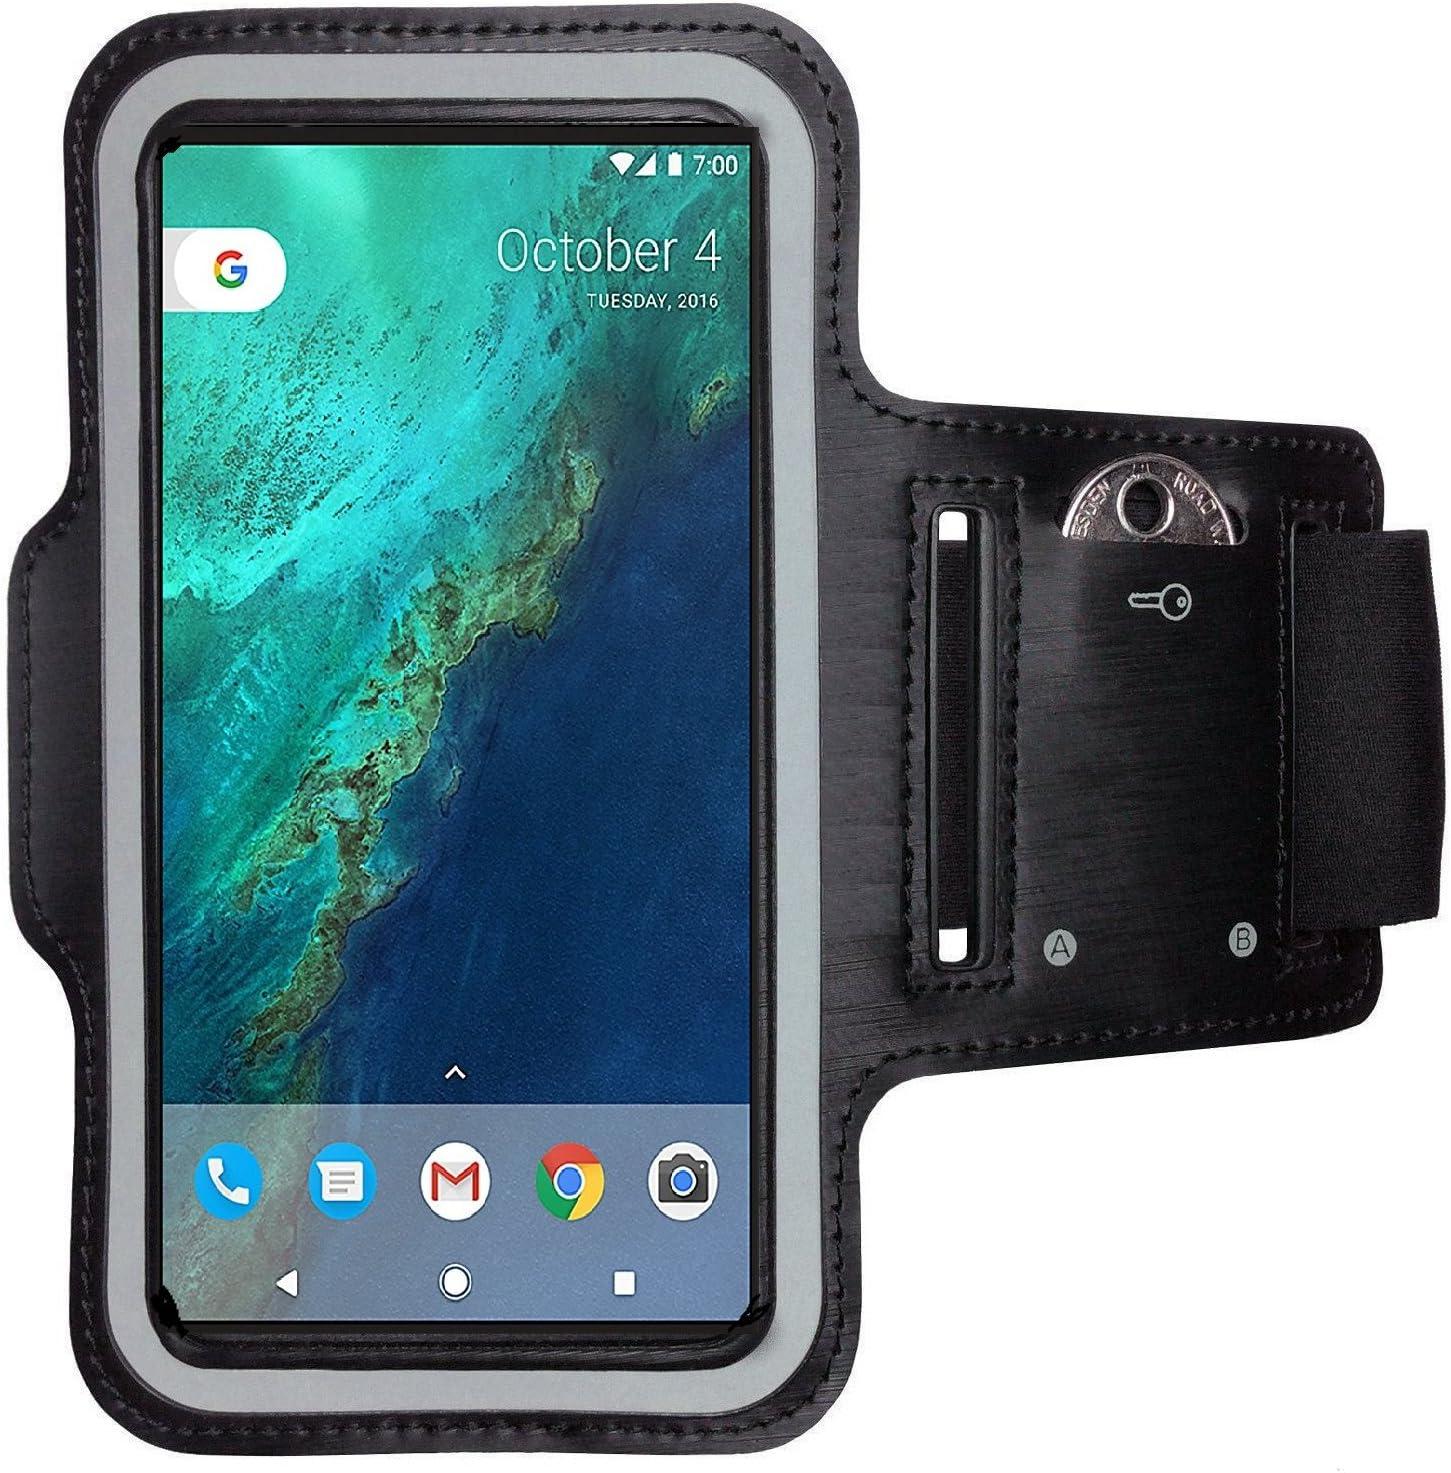 CoverKingz Armtasche f/ür Google Pixel 3 XL Sportarmband mit Schl/üsselfach Laufarmband Fitness Handy Armband Schwarz